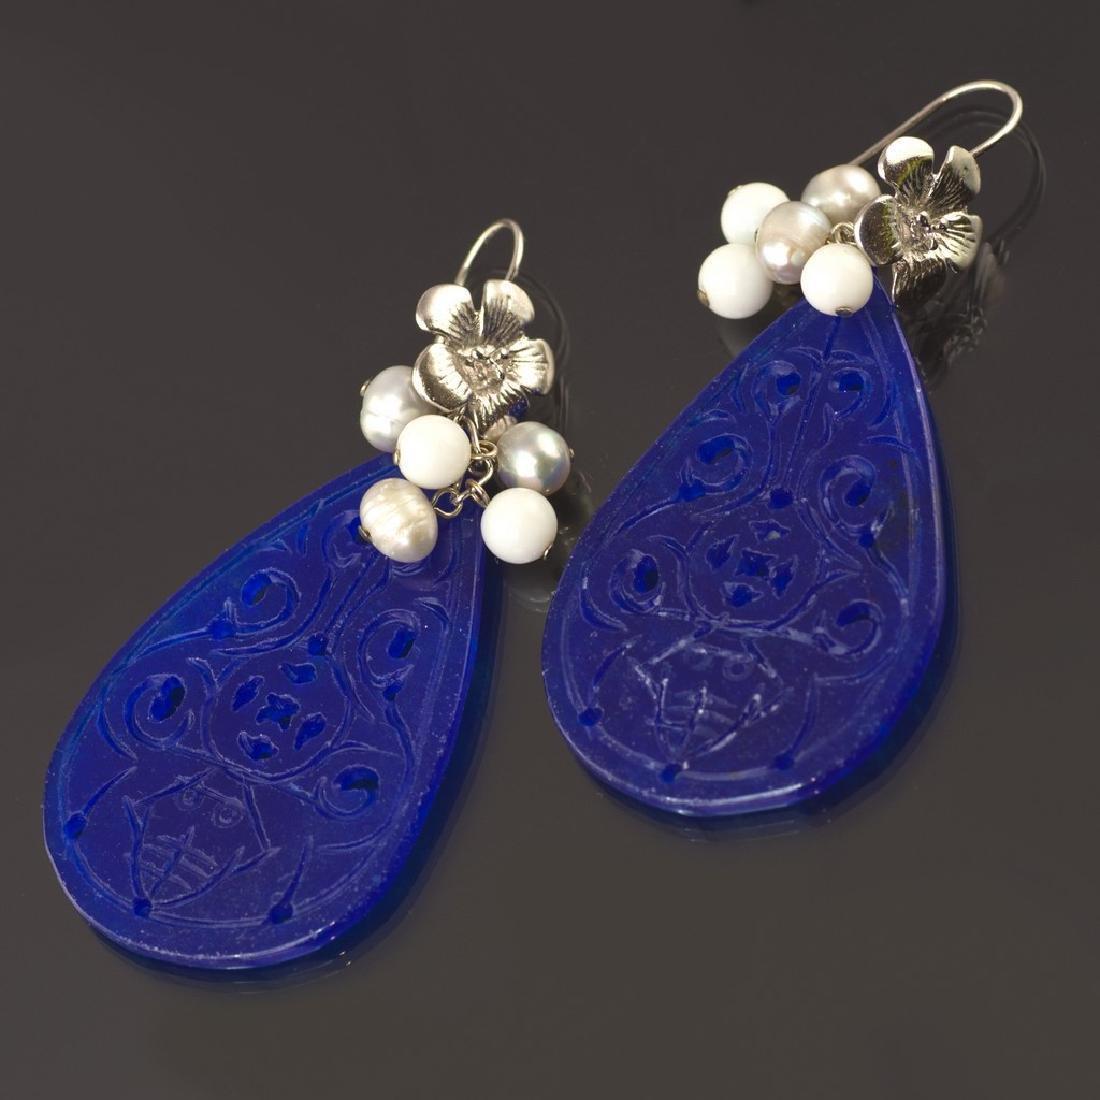 Blue Transparent Jade Earrings - 2